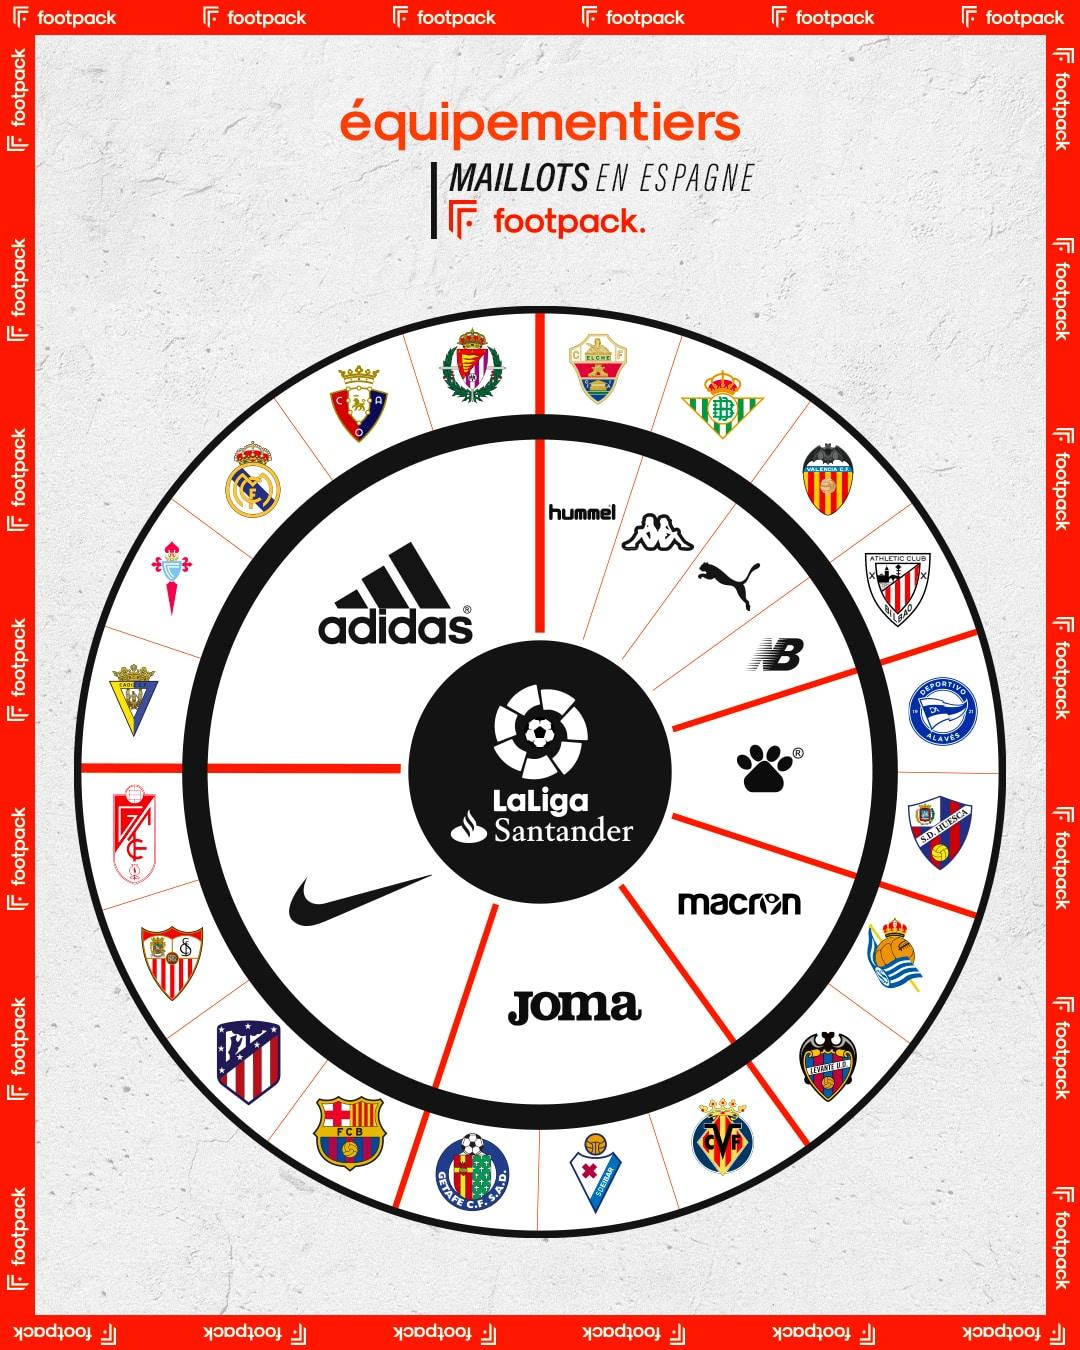 equipementier-liga-santander-2020-2021-footpack